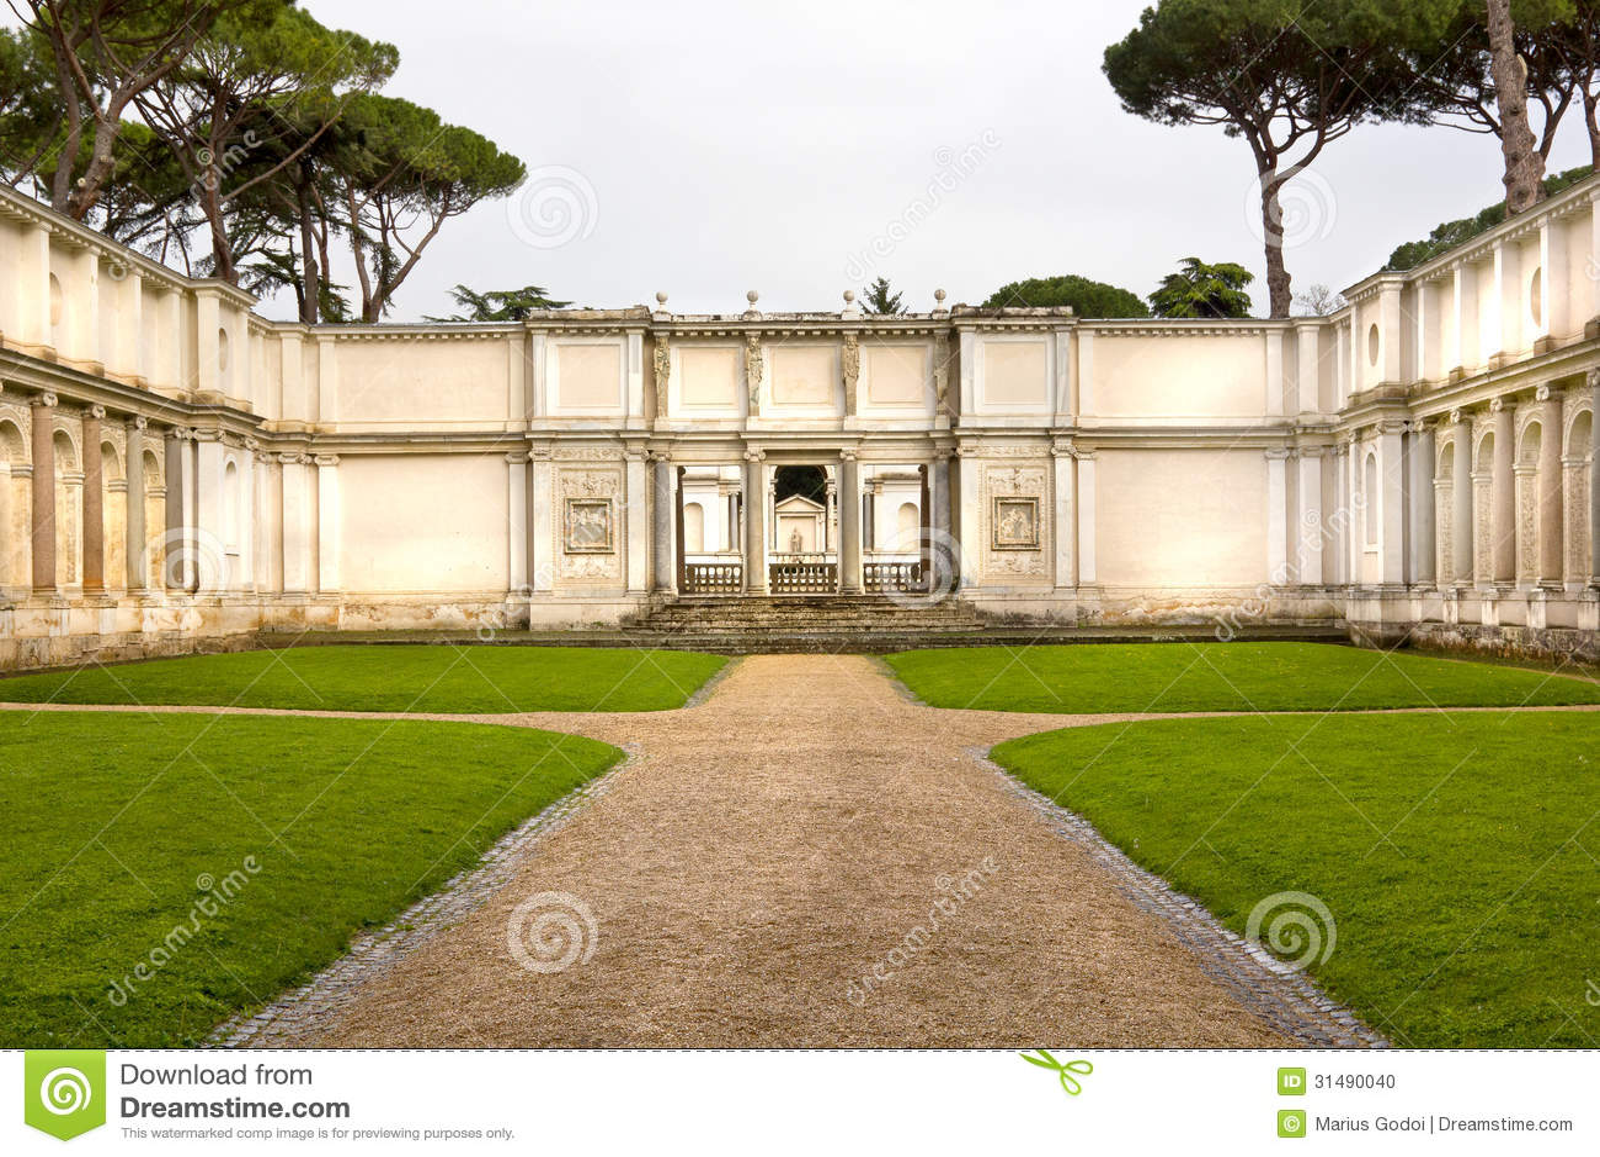 Roman Garden Stock Photo Image 31490040